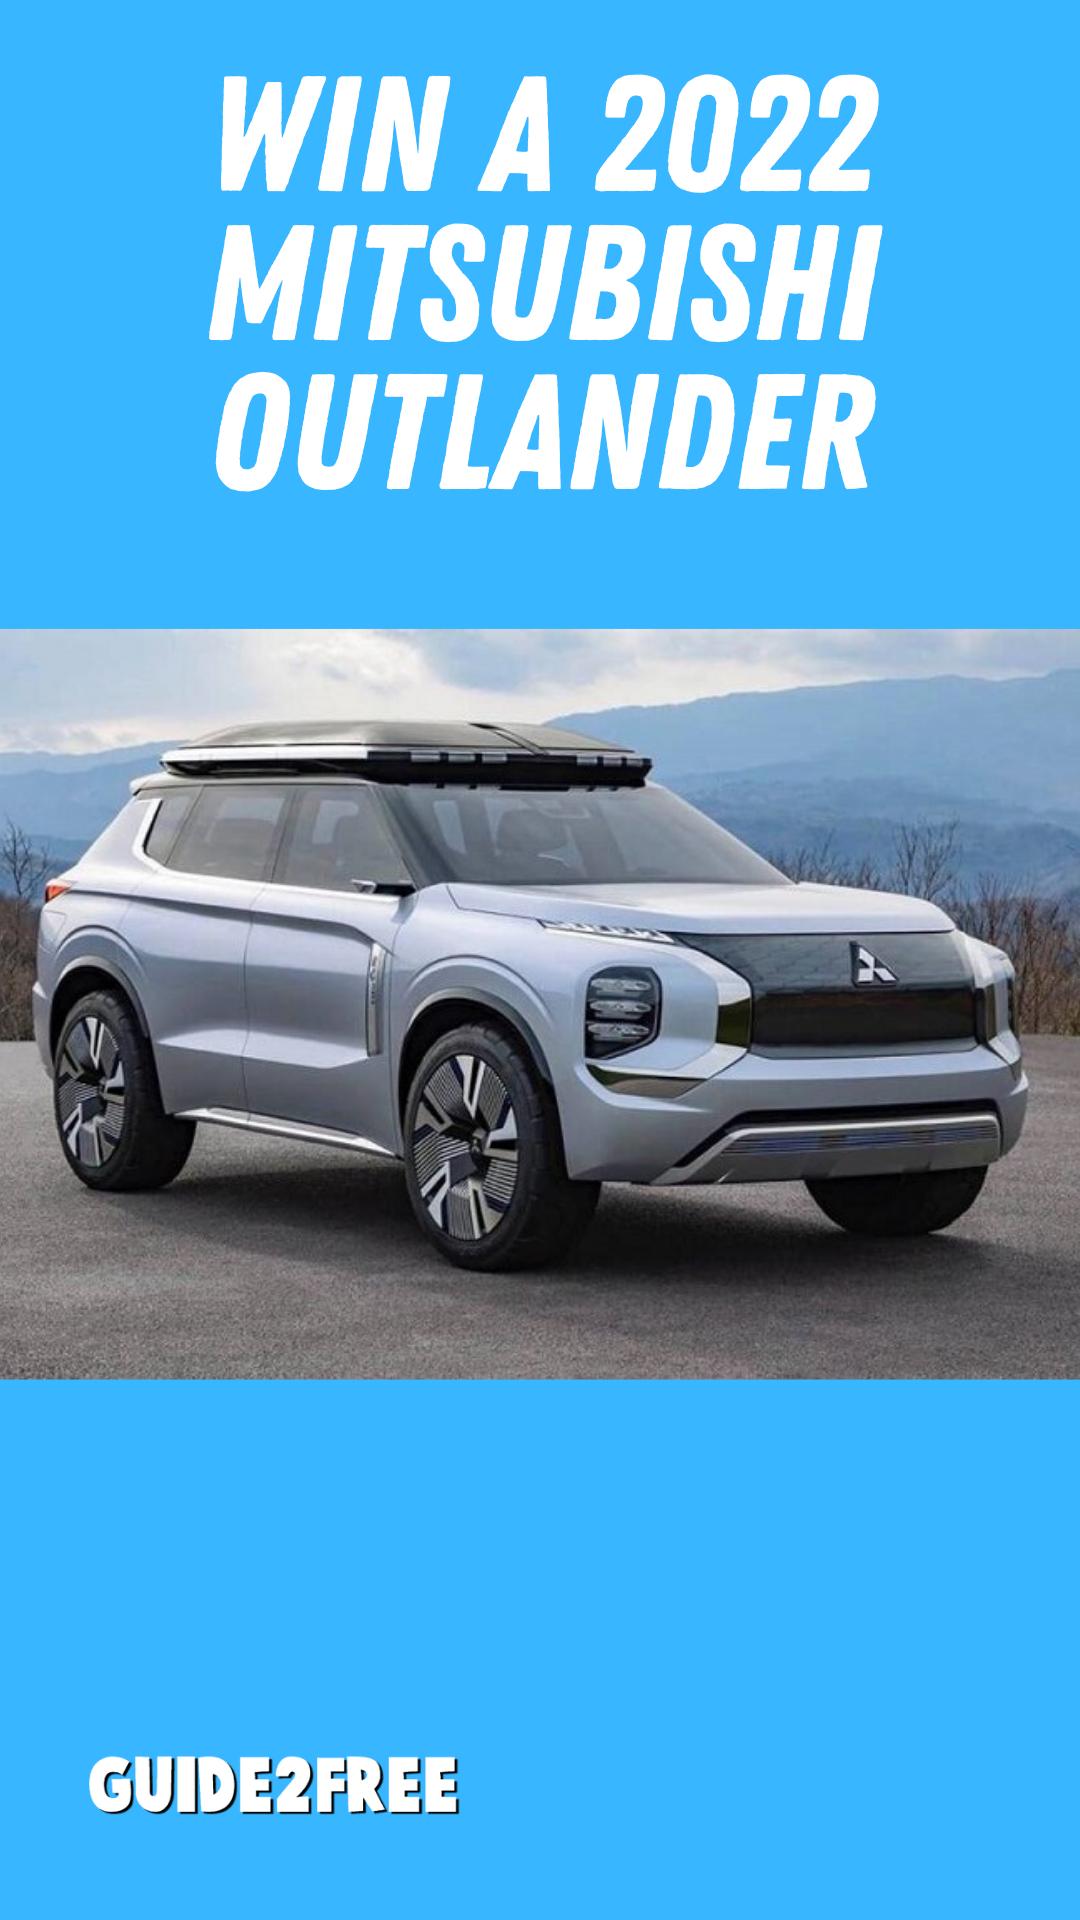 Win A 2022 Mitsubishi Outlander Guide2free Samples In 2021 Mitsubishi Outlander Outlander Mitsubishi